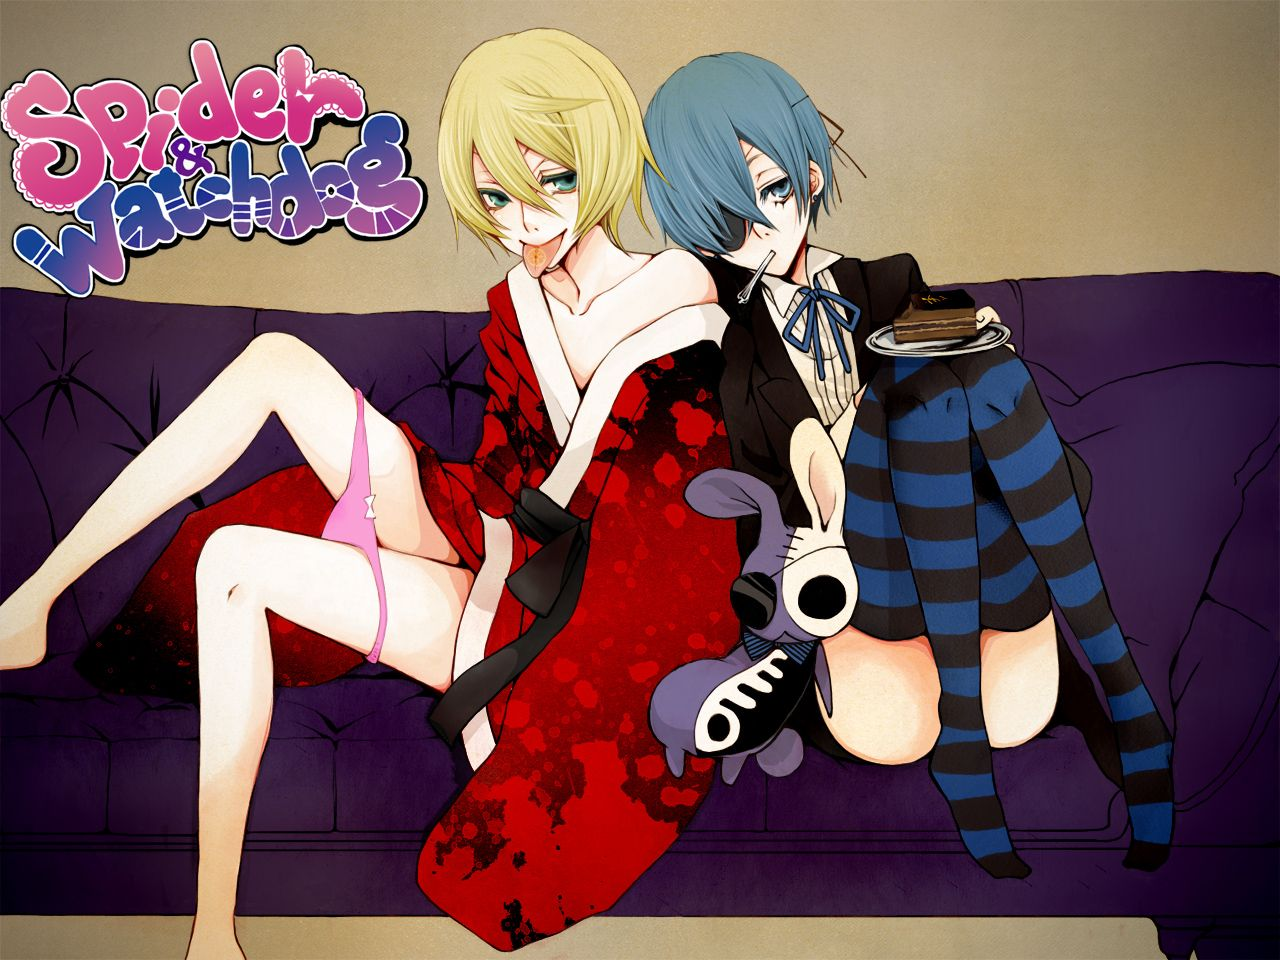 Alois & Ciel Versión Panty & Stocking with Garterbelt